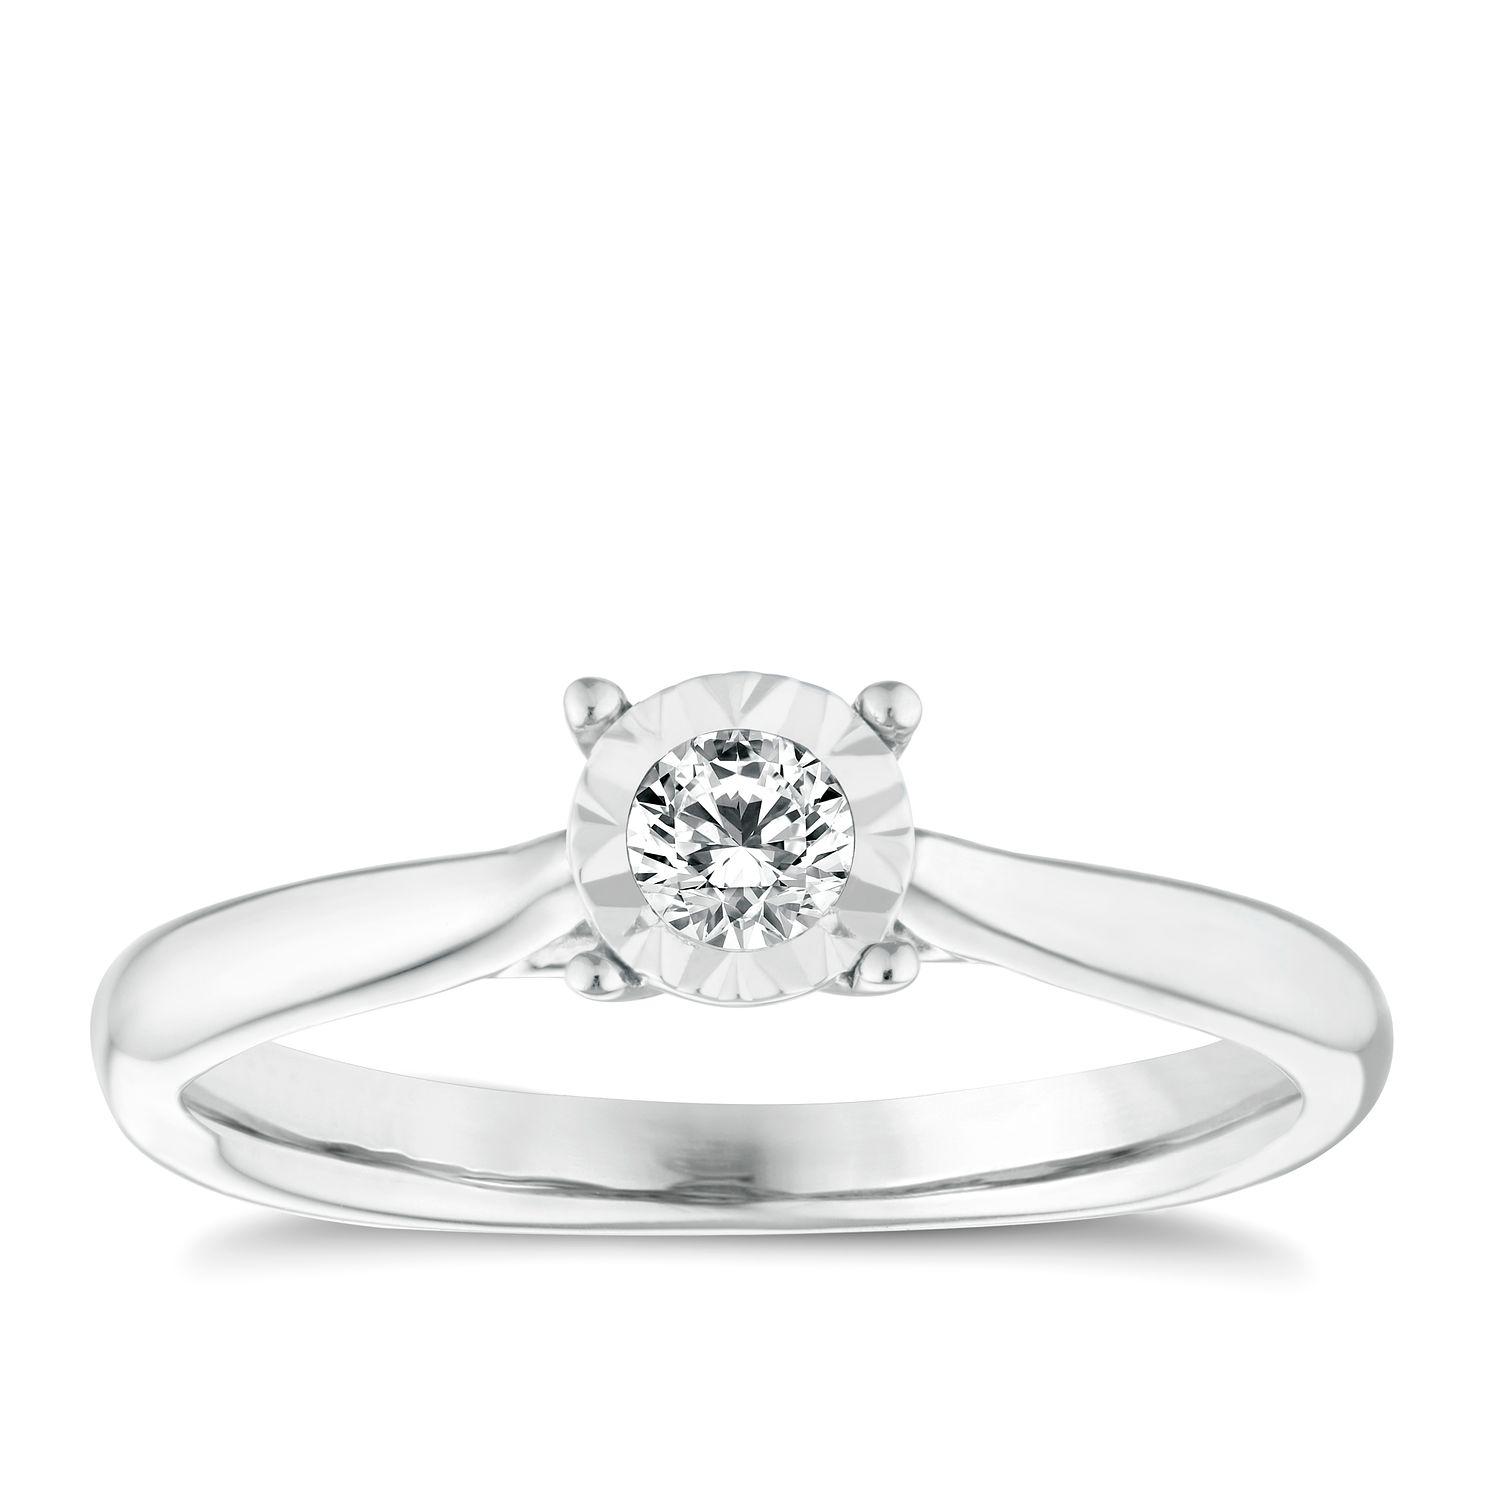 Diamond Engagement Rings Gold Platinum Ernest Jones Jewellery